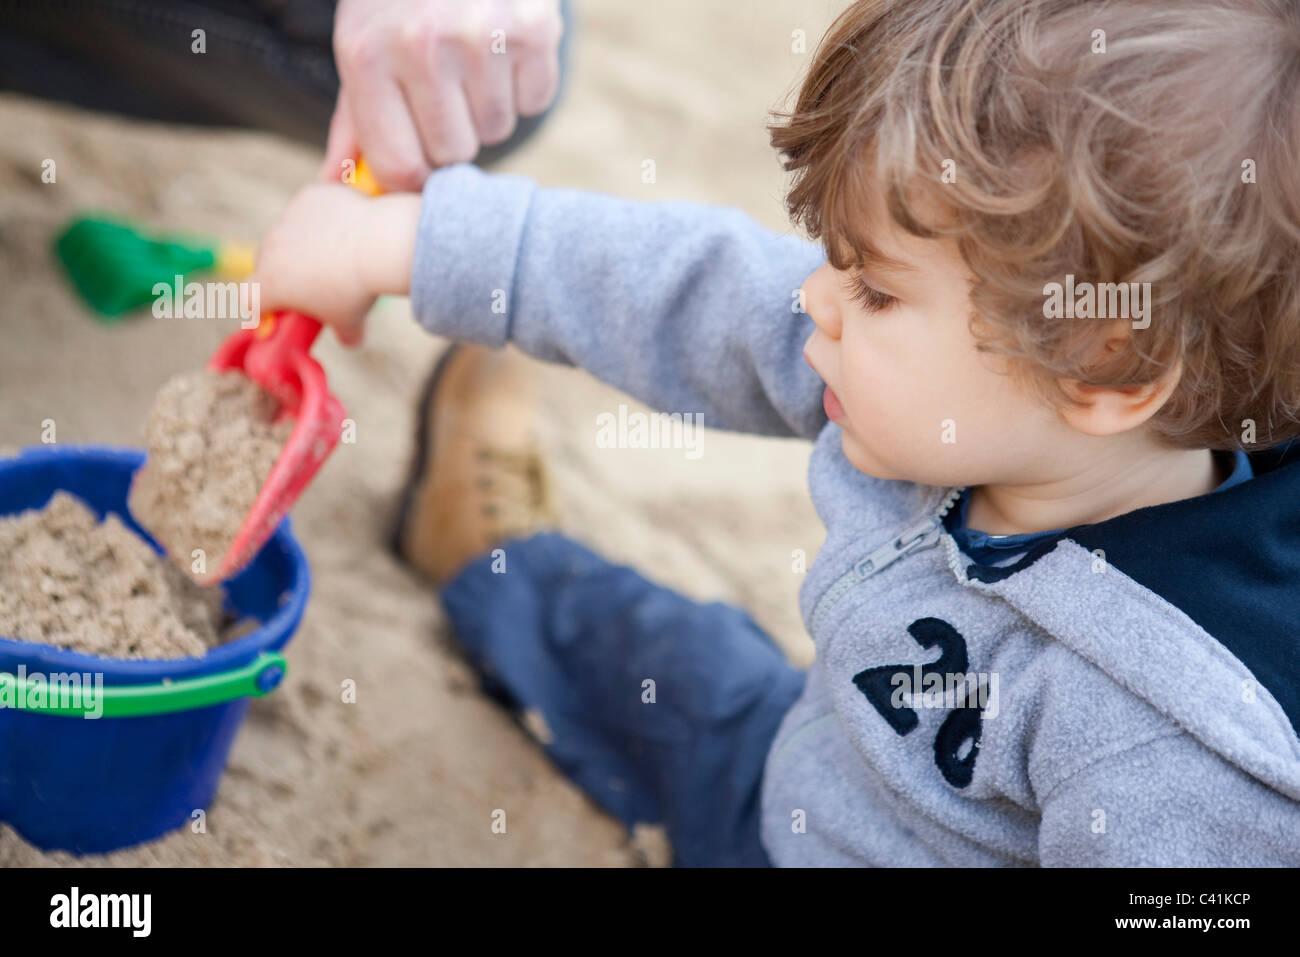 Toddler boy shoveling sand into bucket - Stock Image